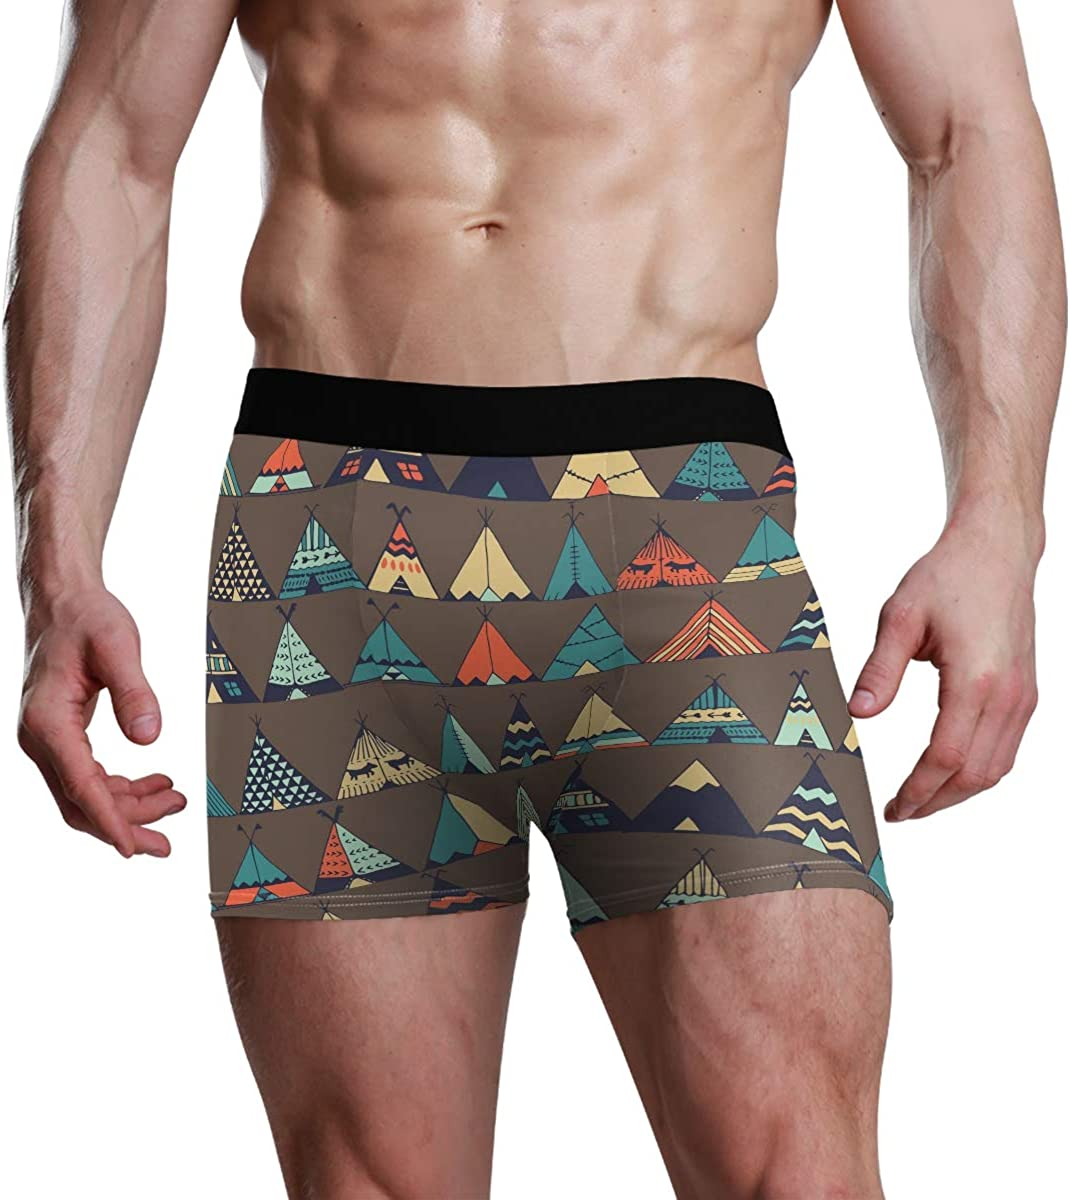 Men's Boxer Briefs Teepee Native American Summer Tent Illustration in Vector Bikini Underwear Stretch Trunks Boys Underpants